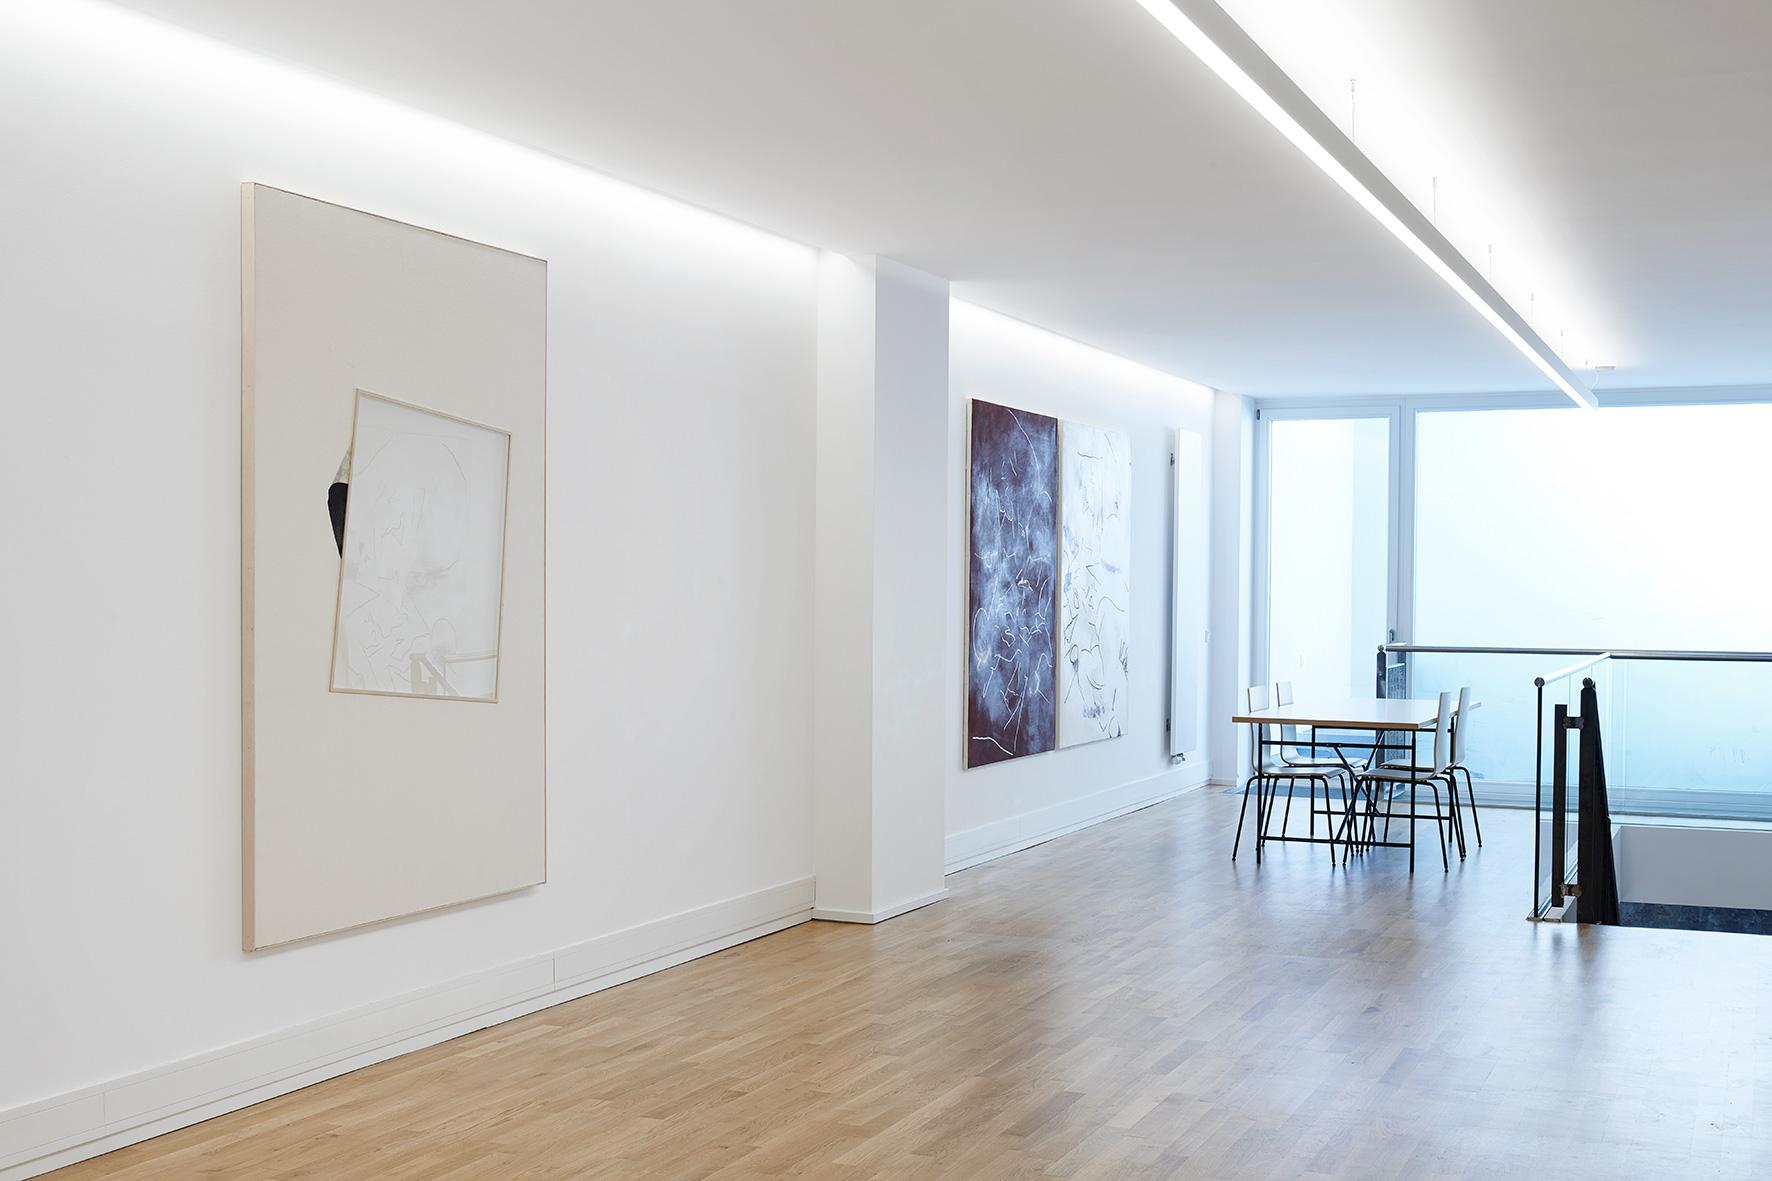 2019.03.19_Galerie-Alber_04.web.jpg